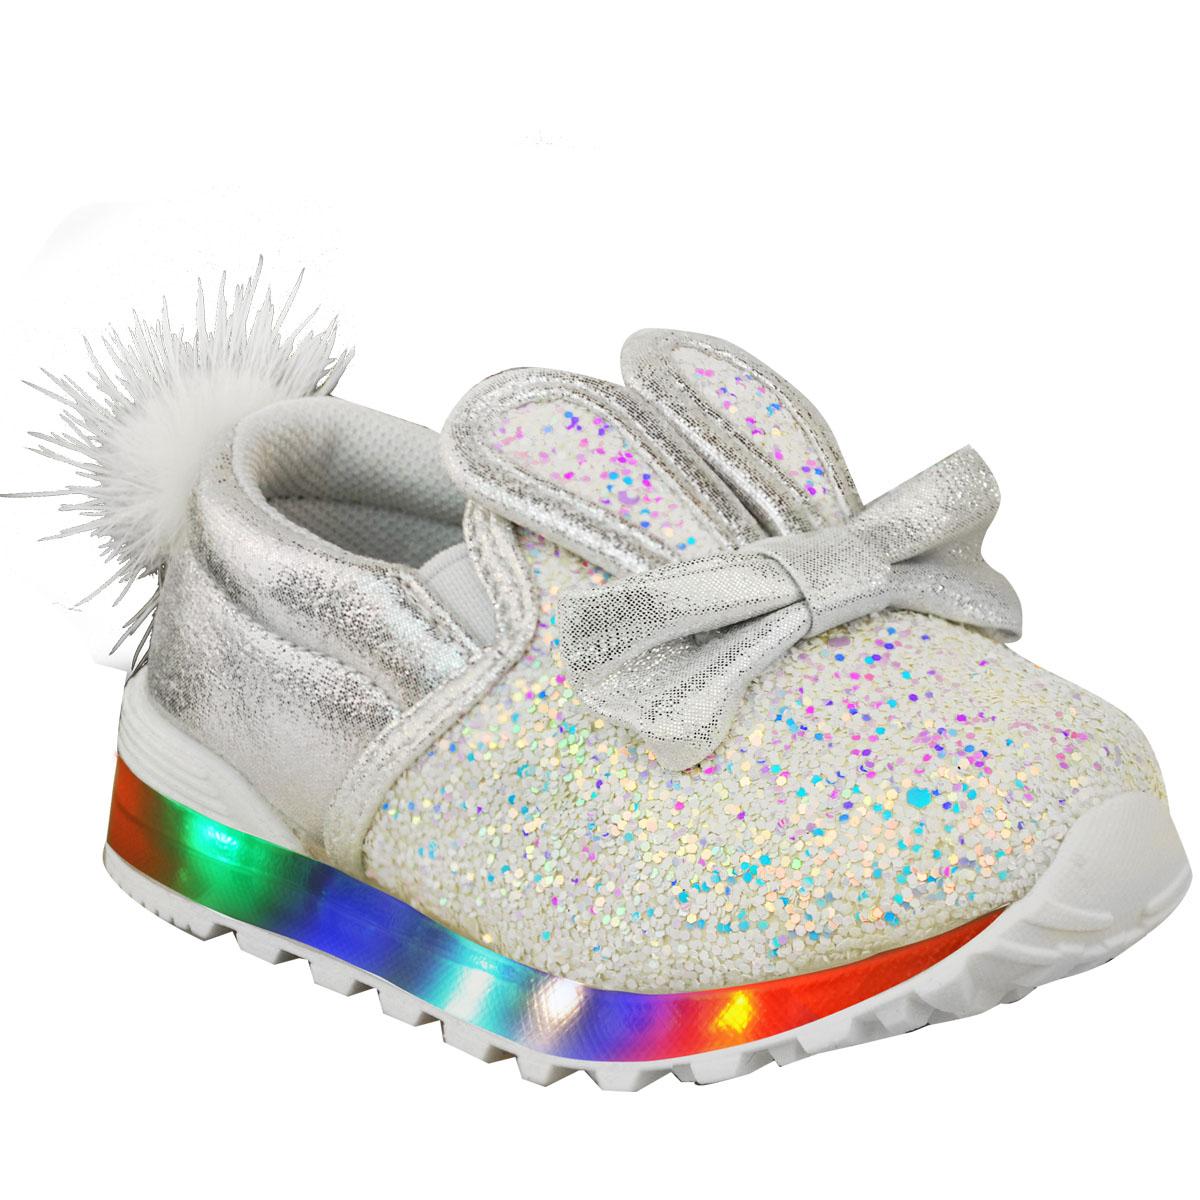 Neuf-Enfants-Filles-Bebes-DEL-Light-Up-Baskets-Lanieres-Baskets-Bebe-Chaussures-Taille